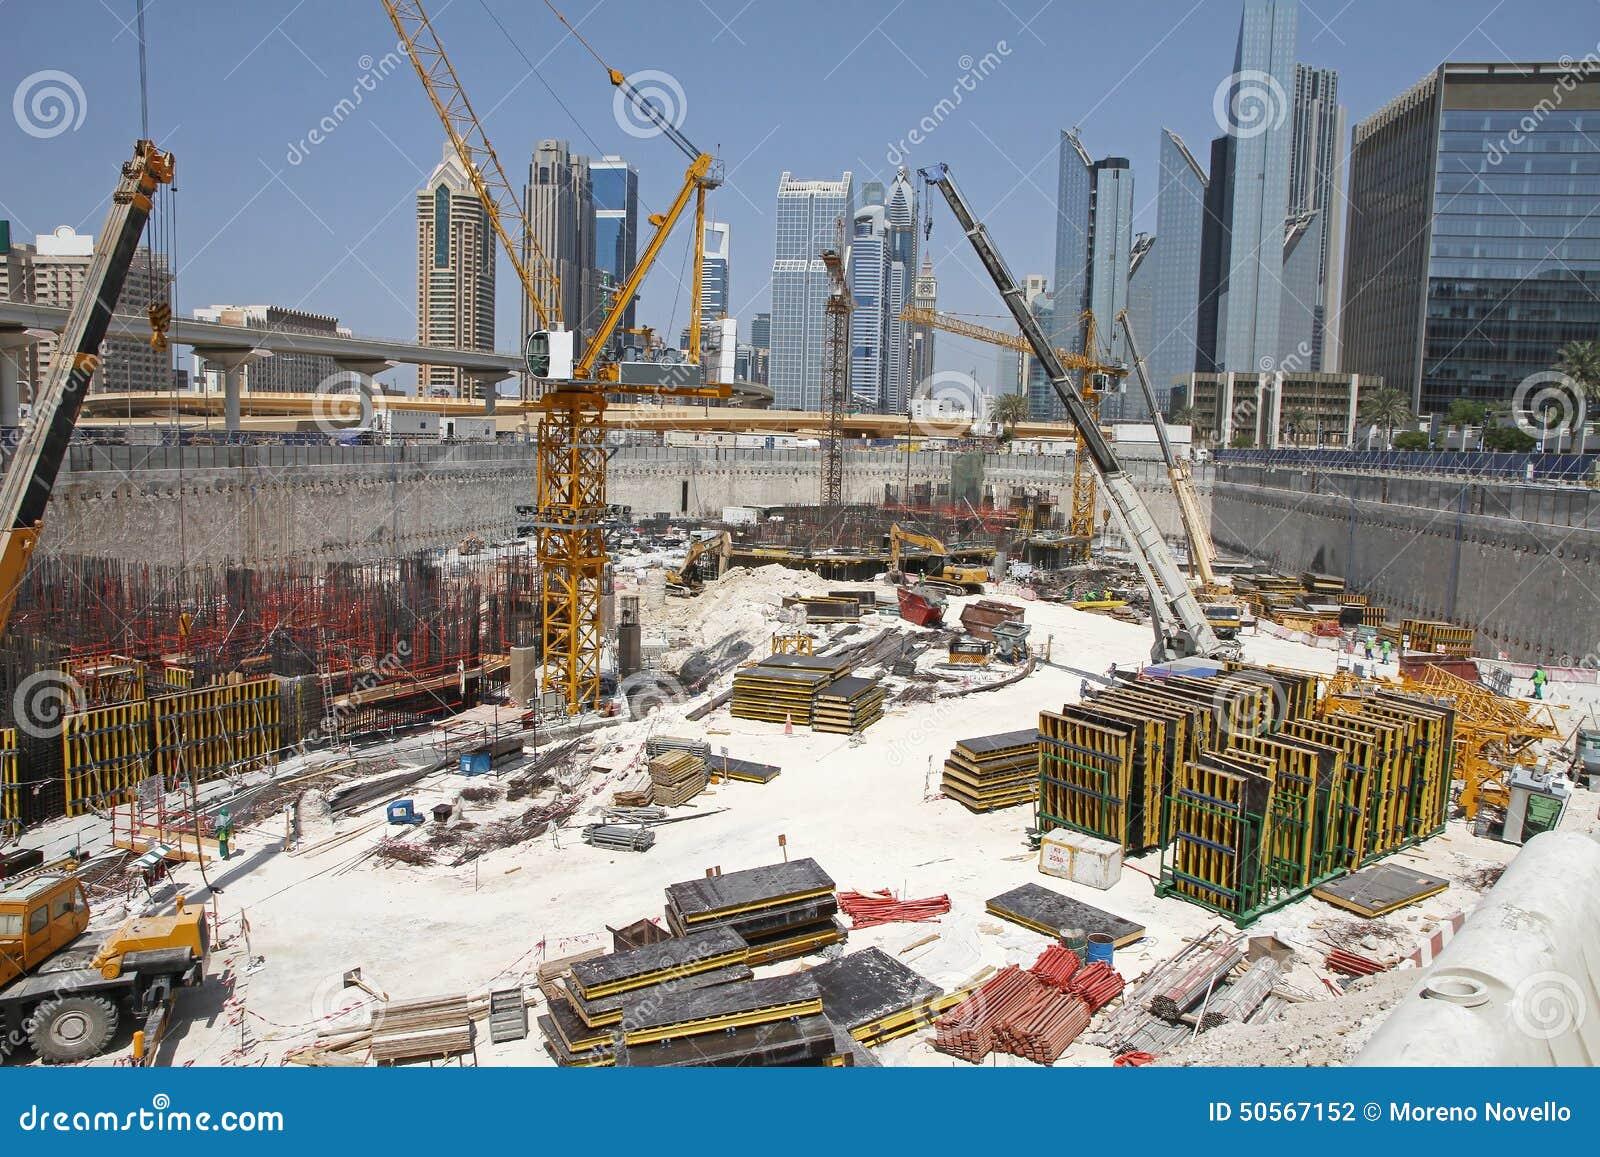 Back Yard Excavation : Construction yard stock photo image of steel building